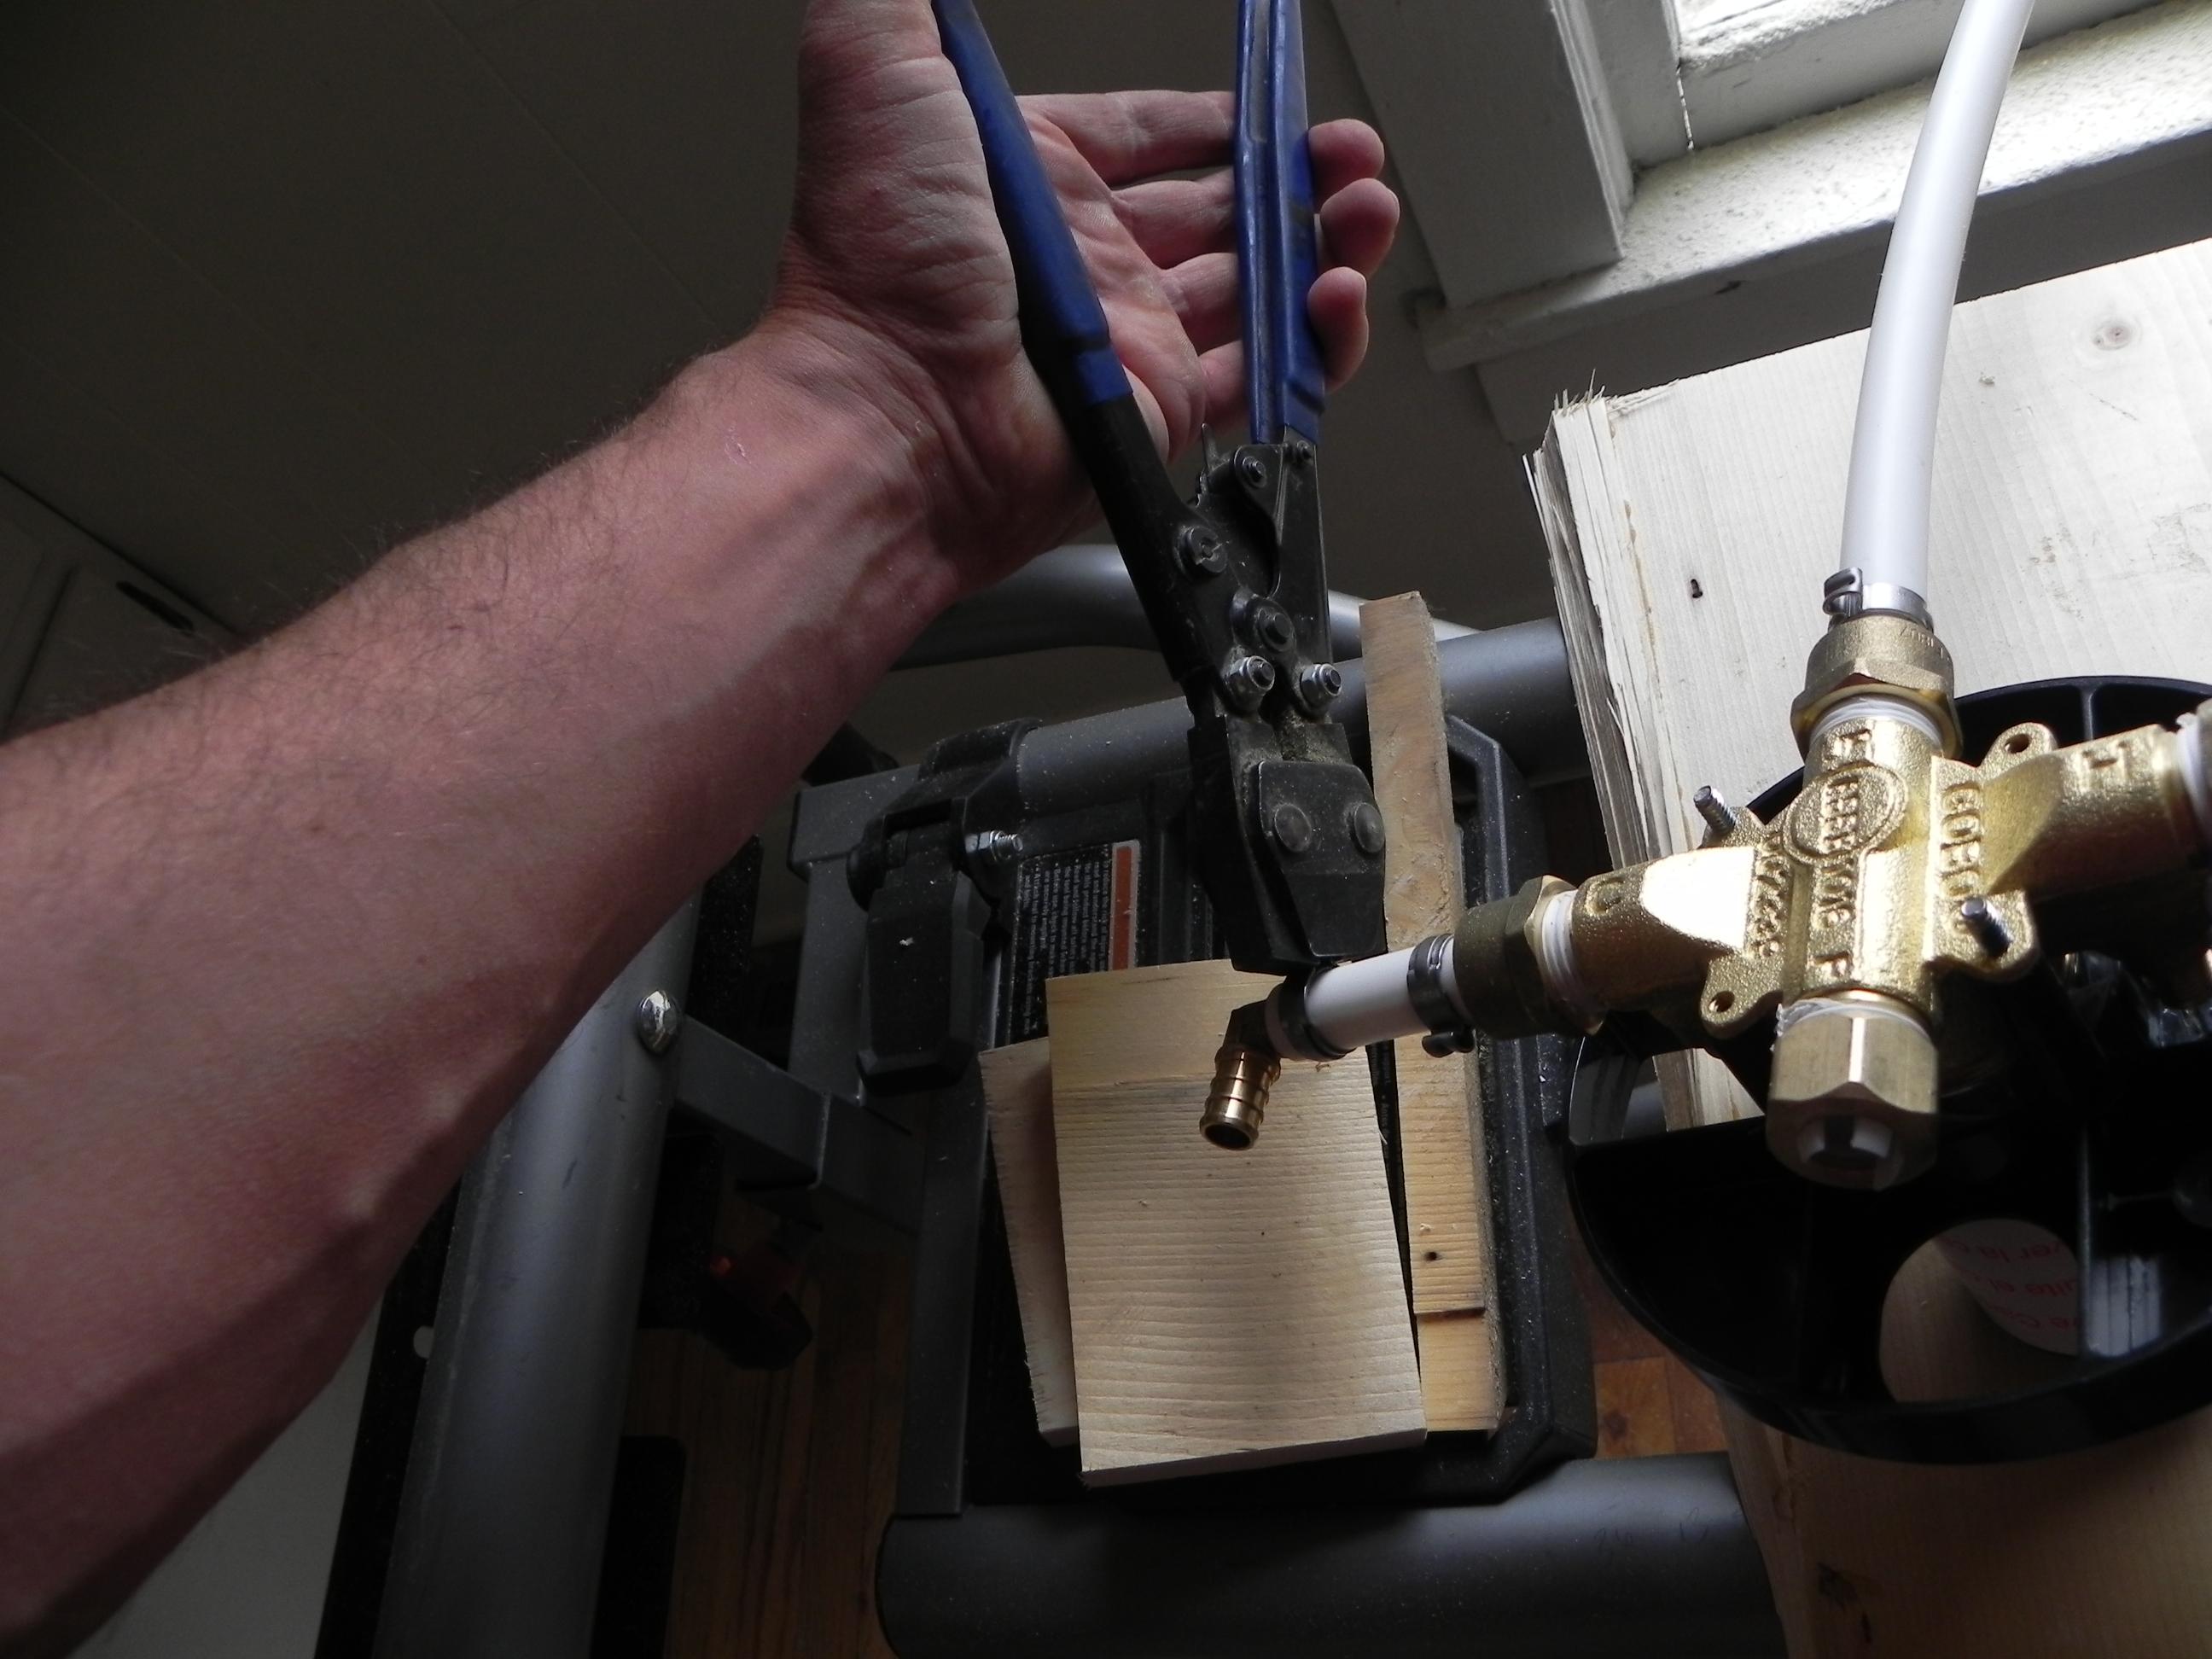 plumbing shark hose bite pipe tubing